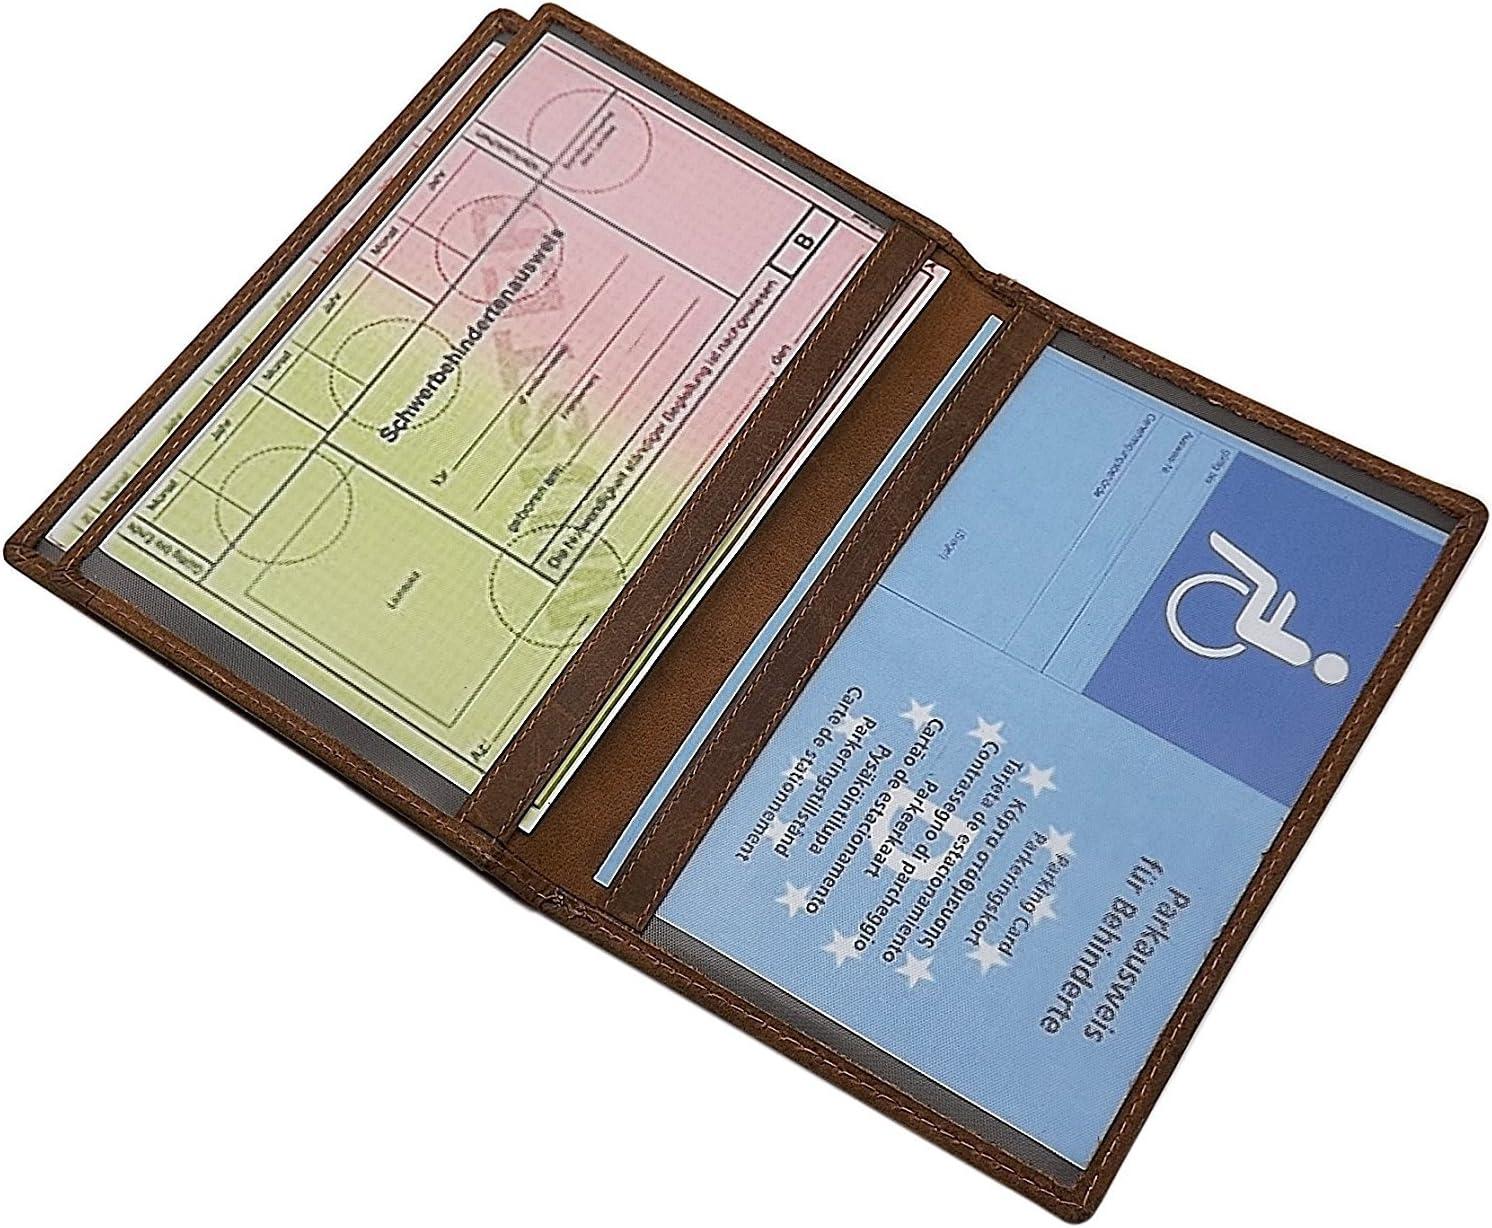 or Fish-Motif in Brown Buffalo Full Leather ID Card Holder with Deer- Wild-Boar- Deer Motif